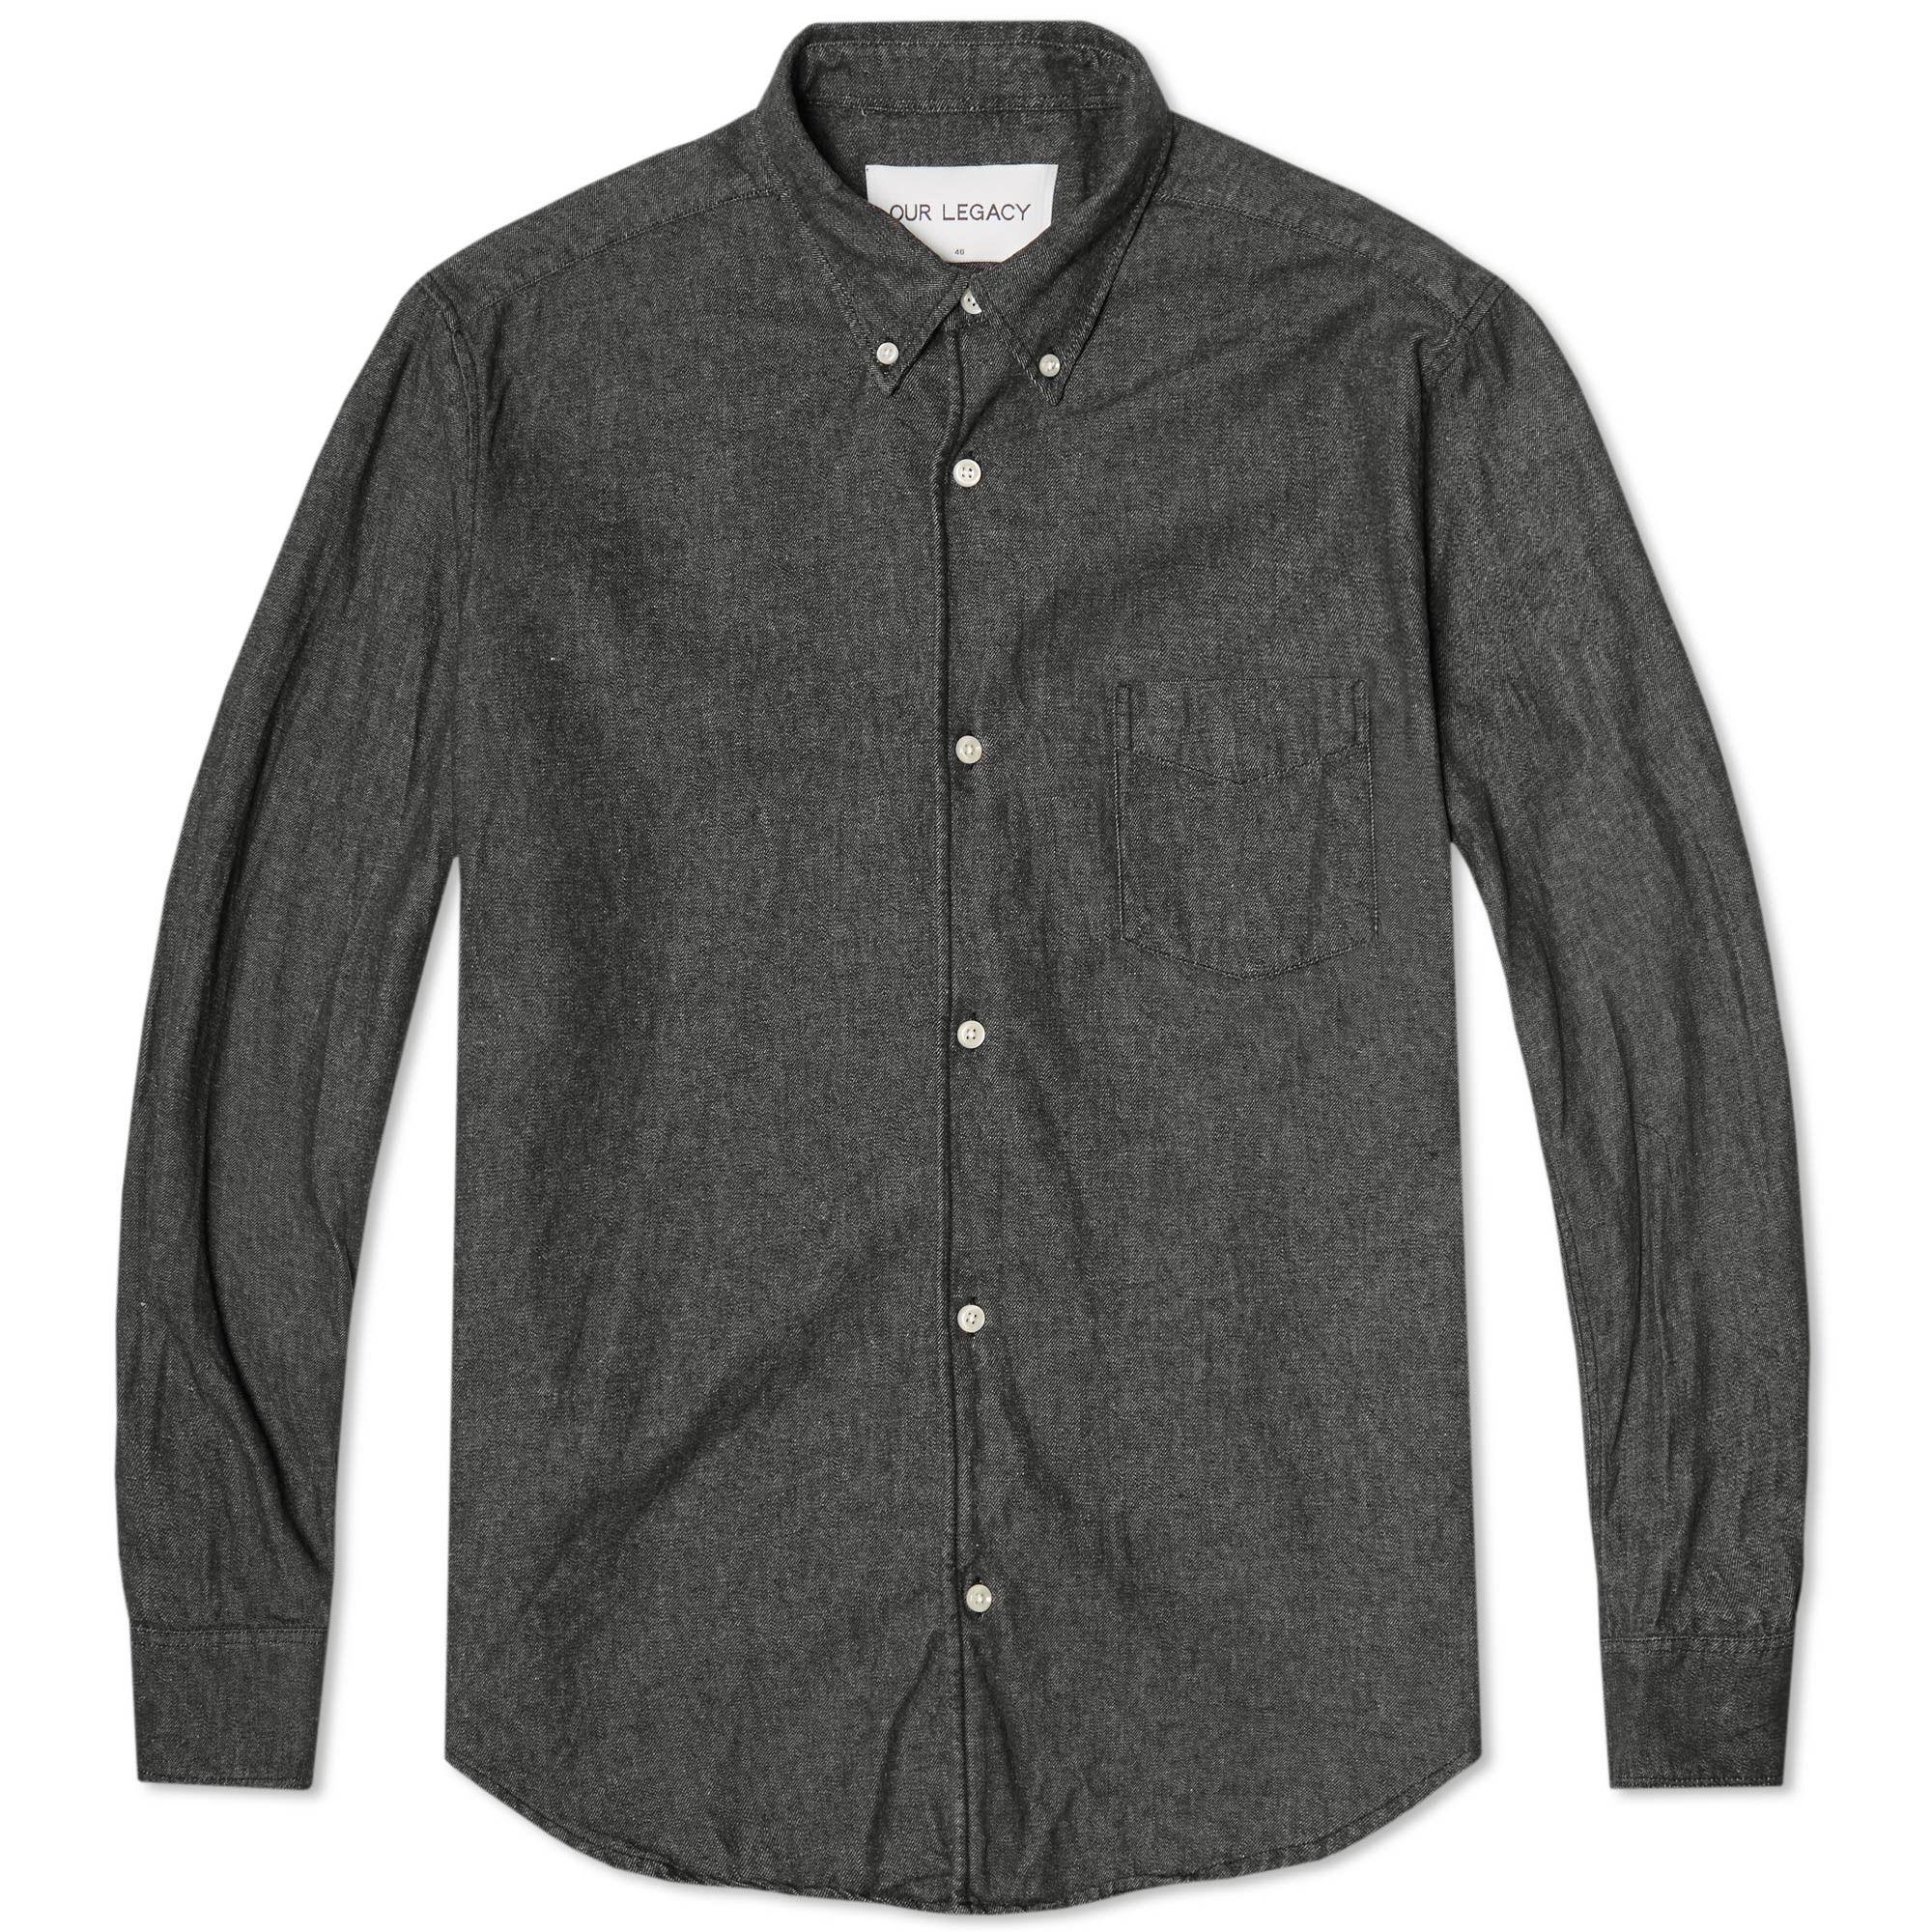 Our Legacy Everyman 1950s Button Down Shirt (Black Denim ...